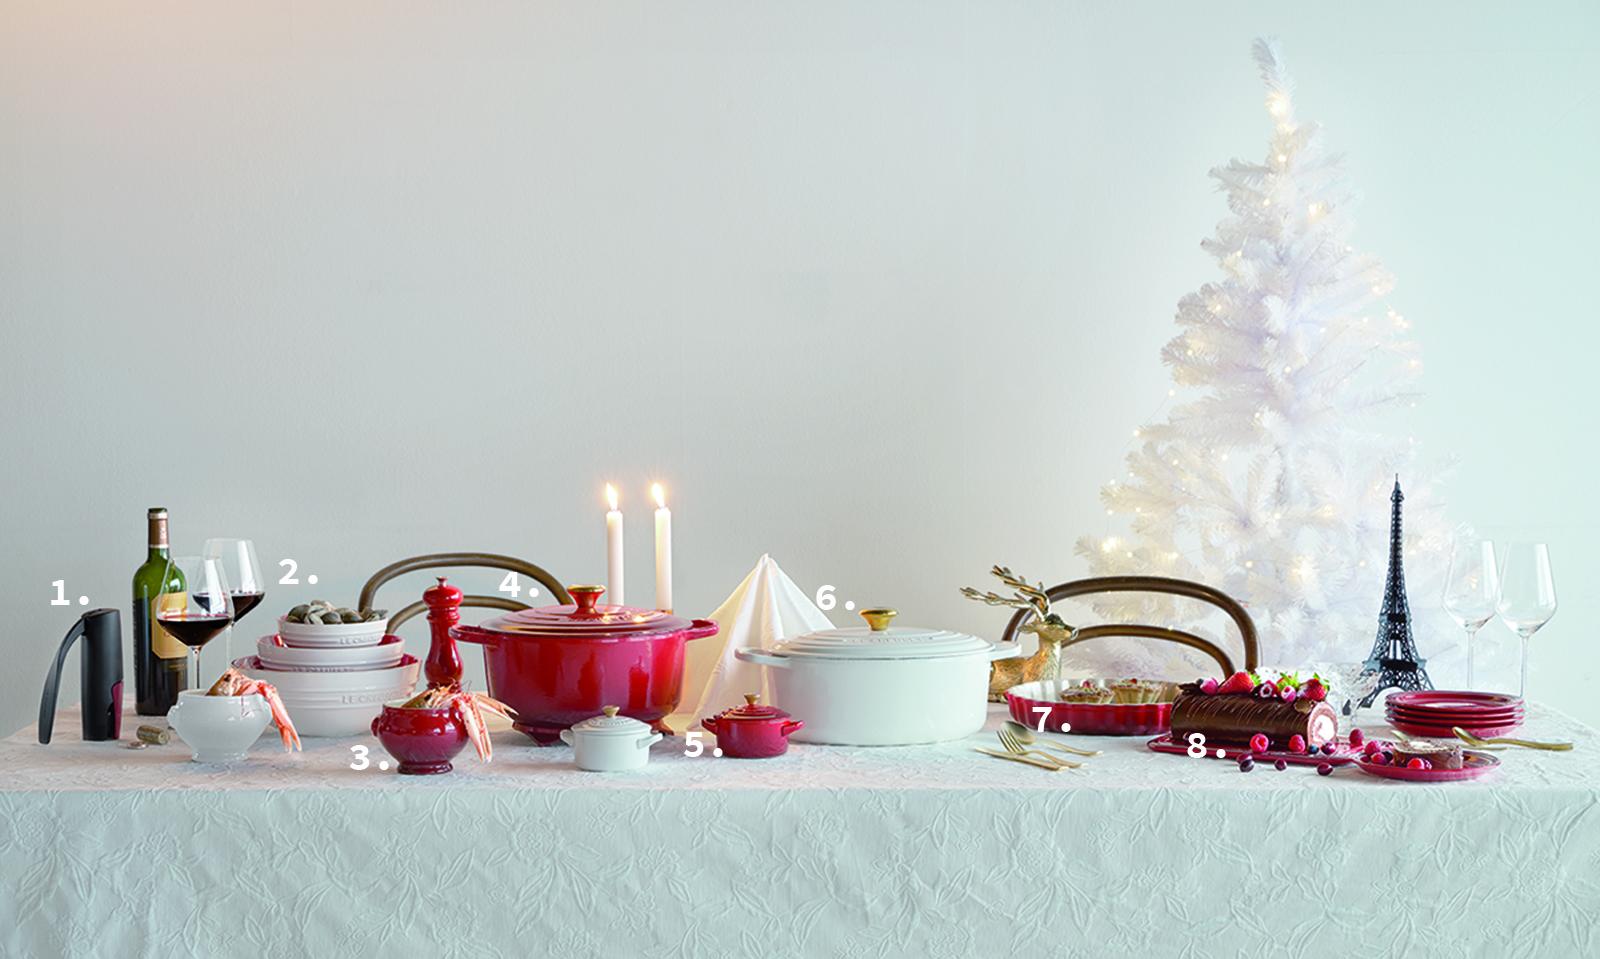 le-creuset-herbstangebot-weihnachtsangebot-angebote-2016-runder-braeter-tarteform-bleywaren-onlineshop-1600